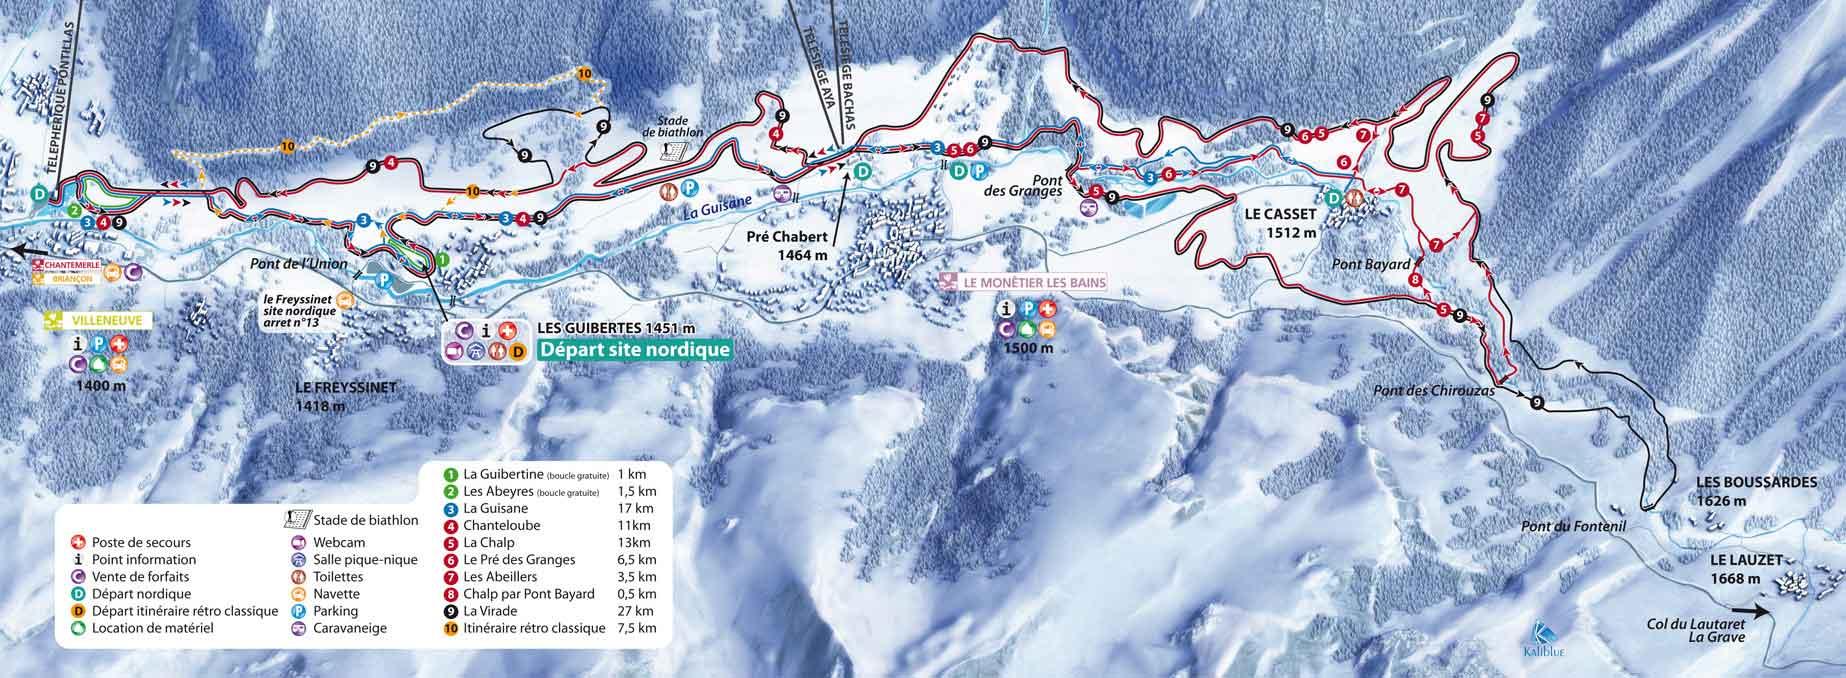 Serre Chevalier Cross Country Skiing Piste Map Alpski Com